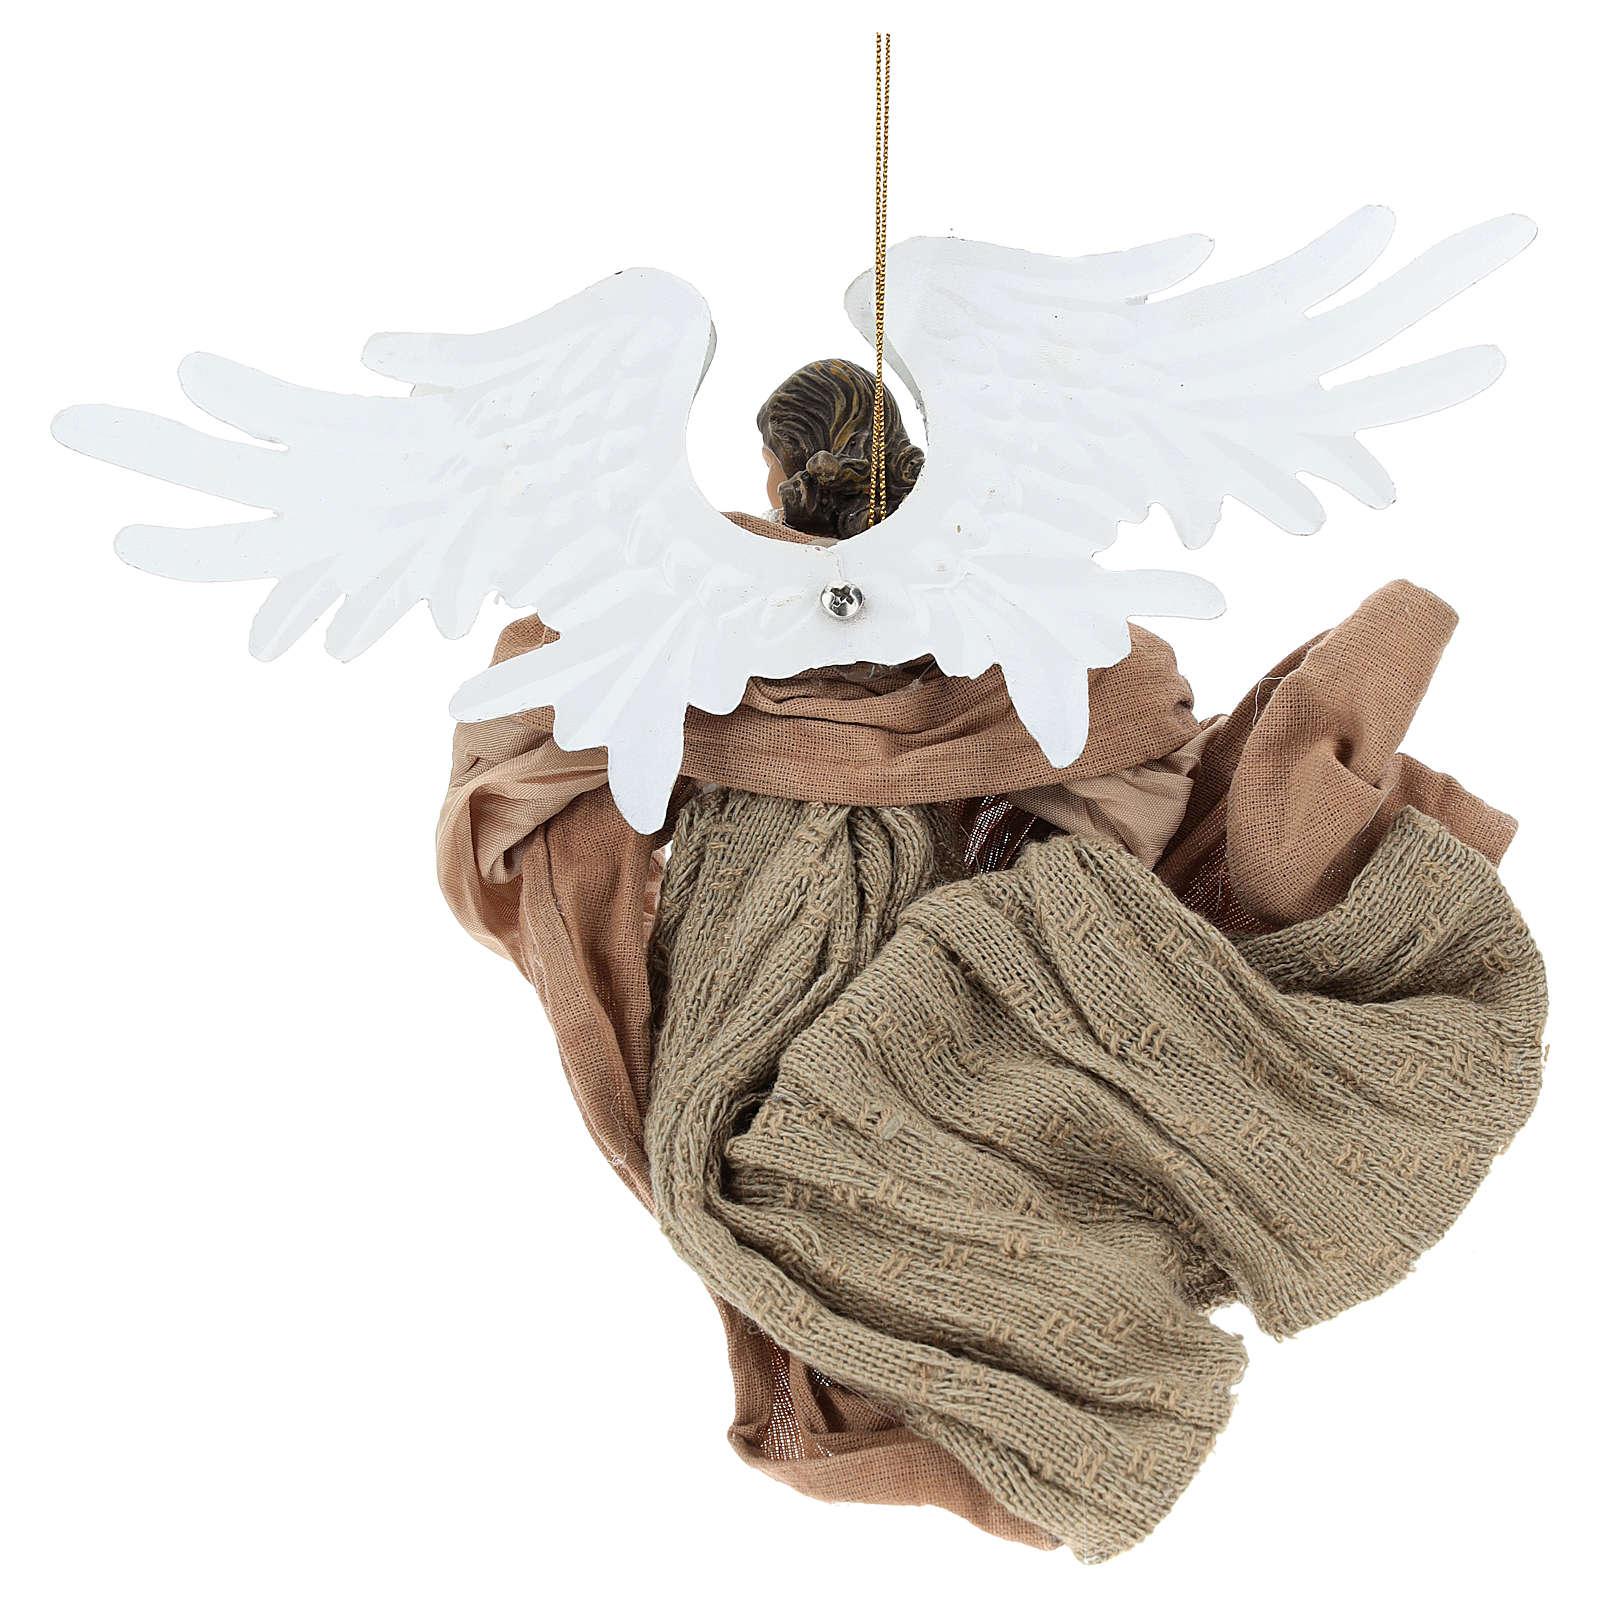 Angelo in volo in terracotta con sguardo verso destra 3